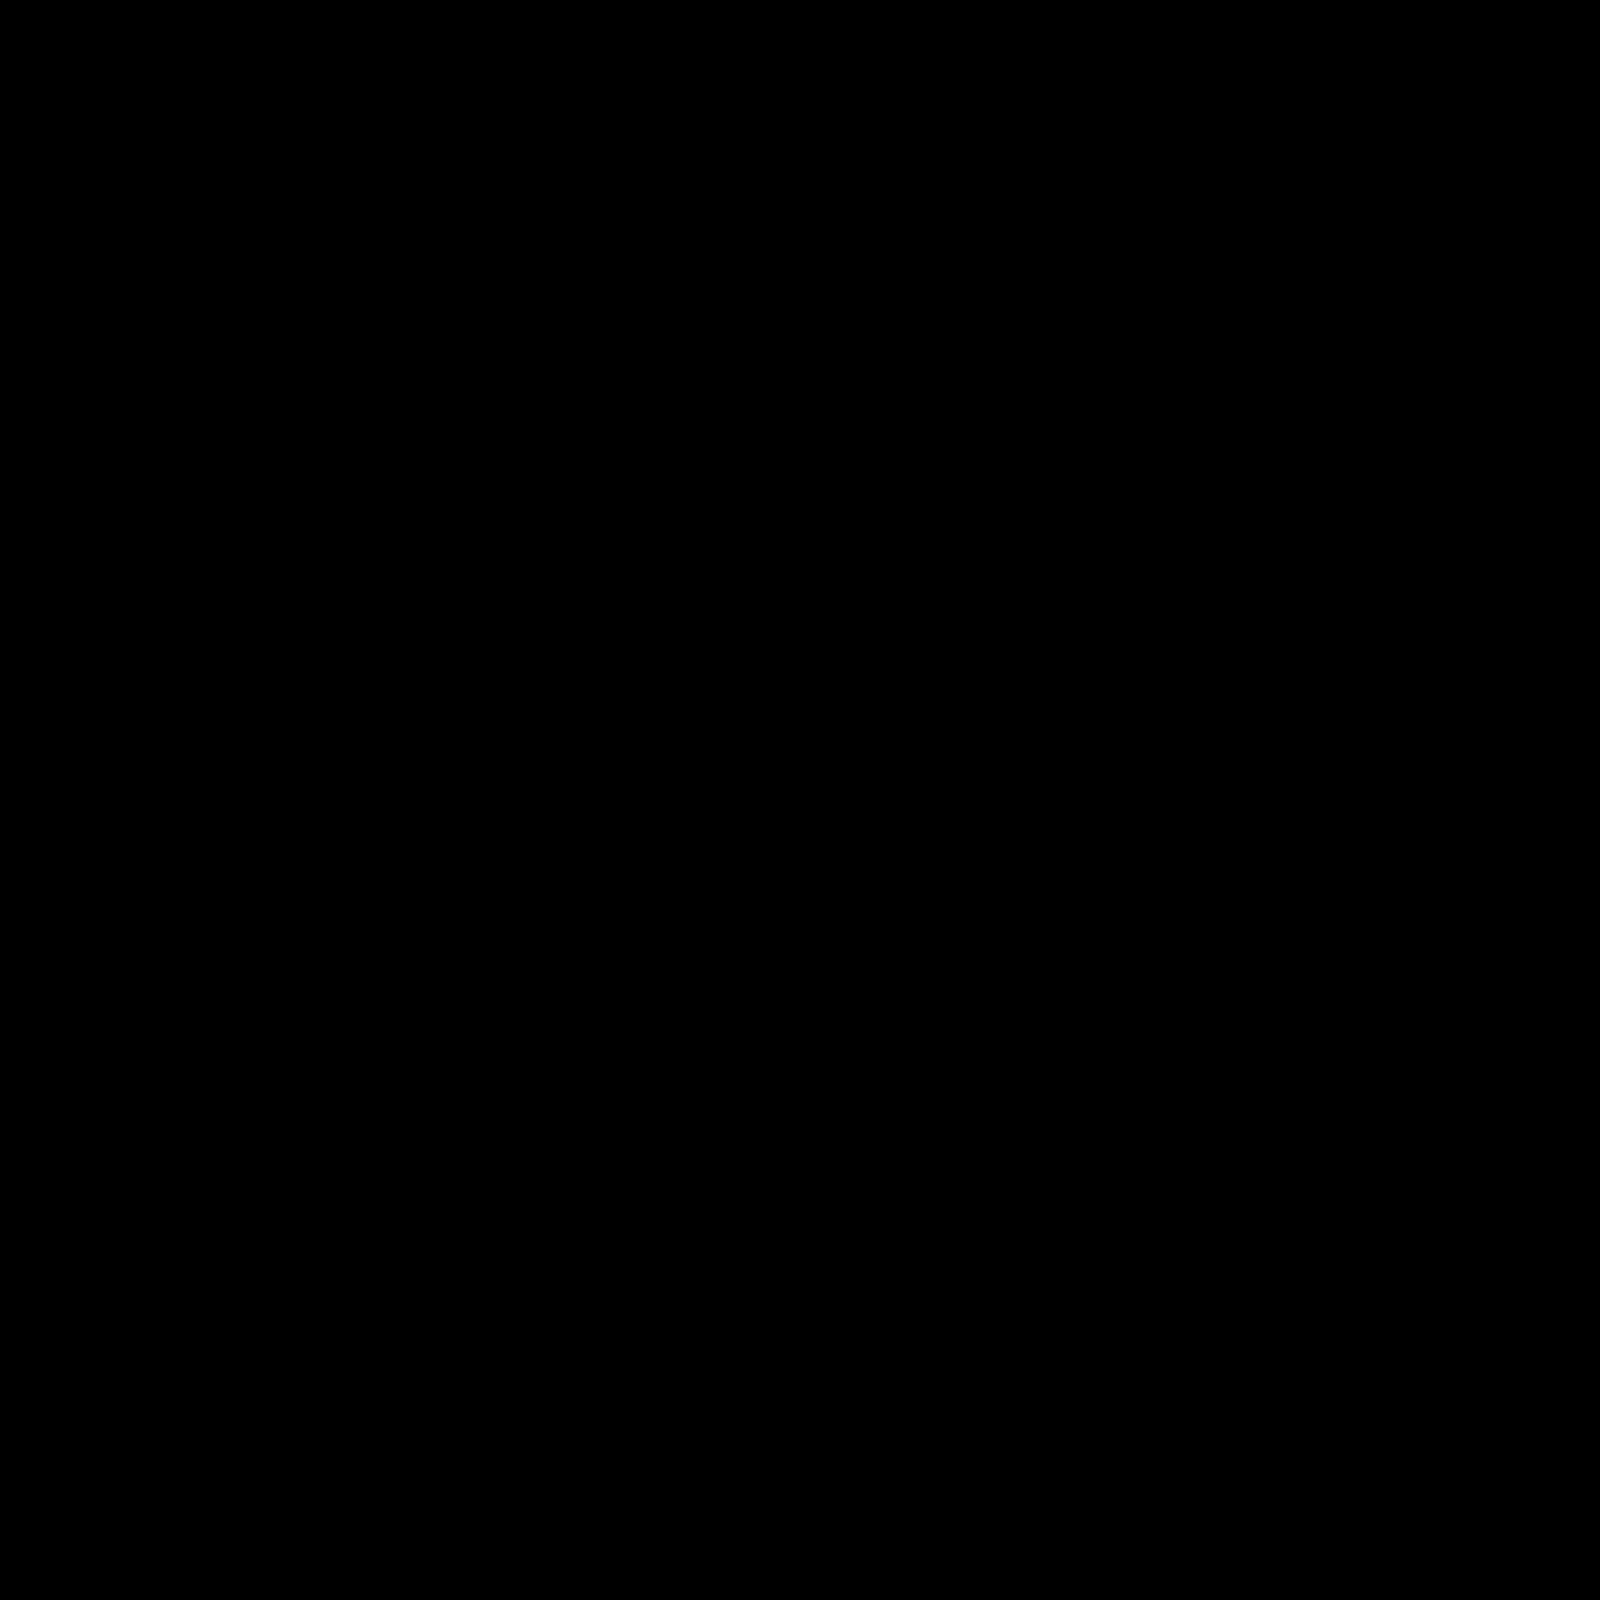 Line Chart Vector